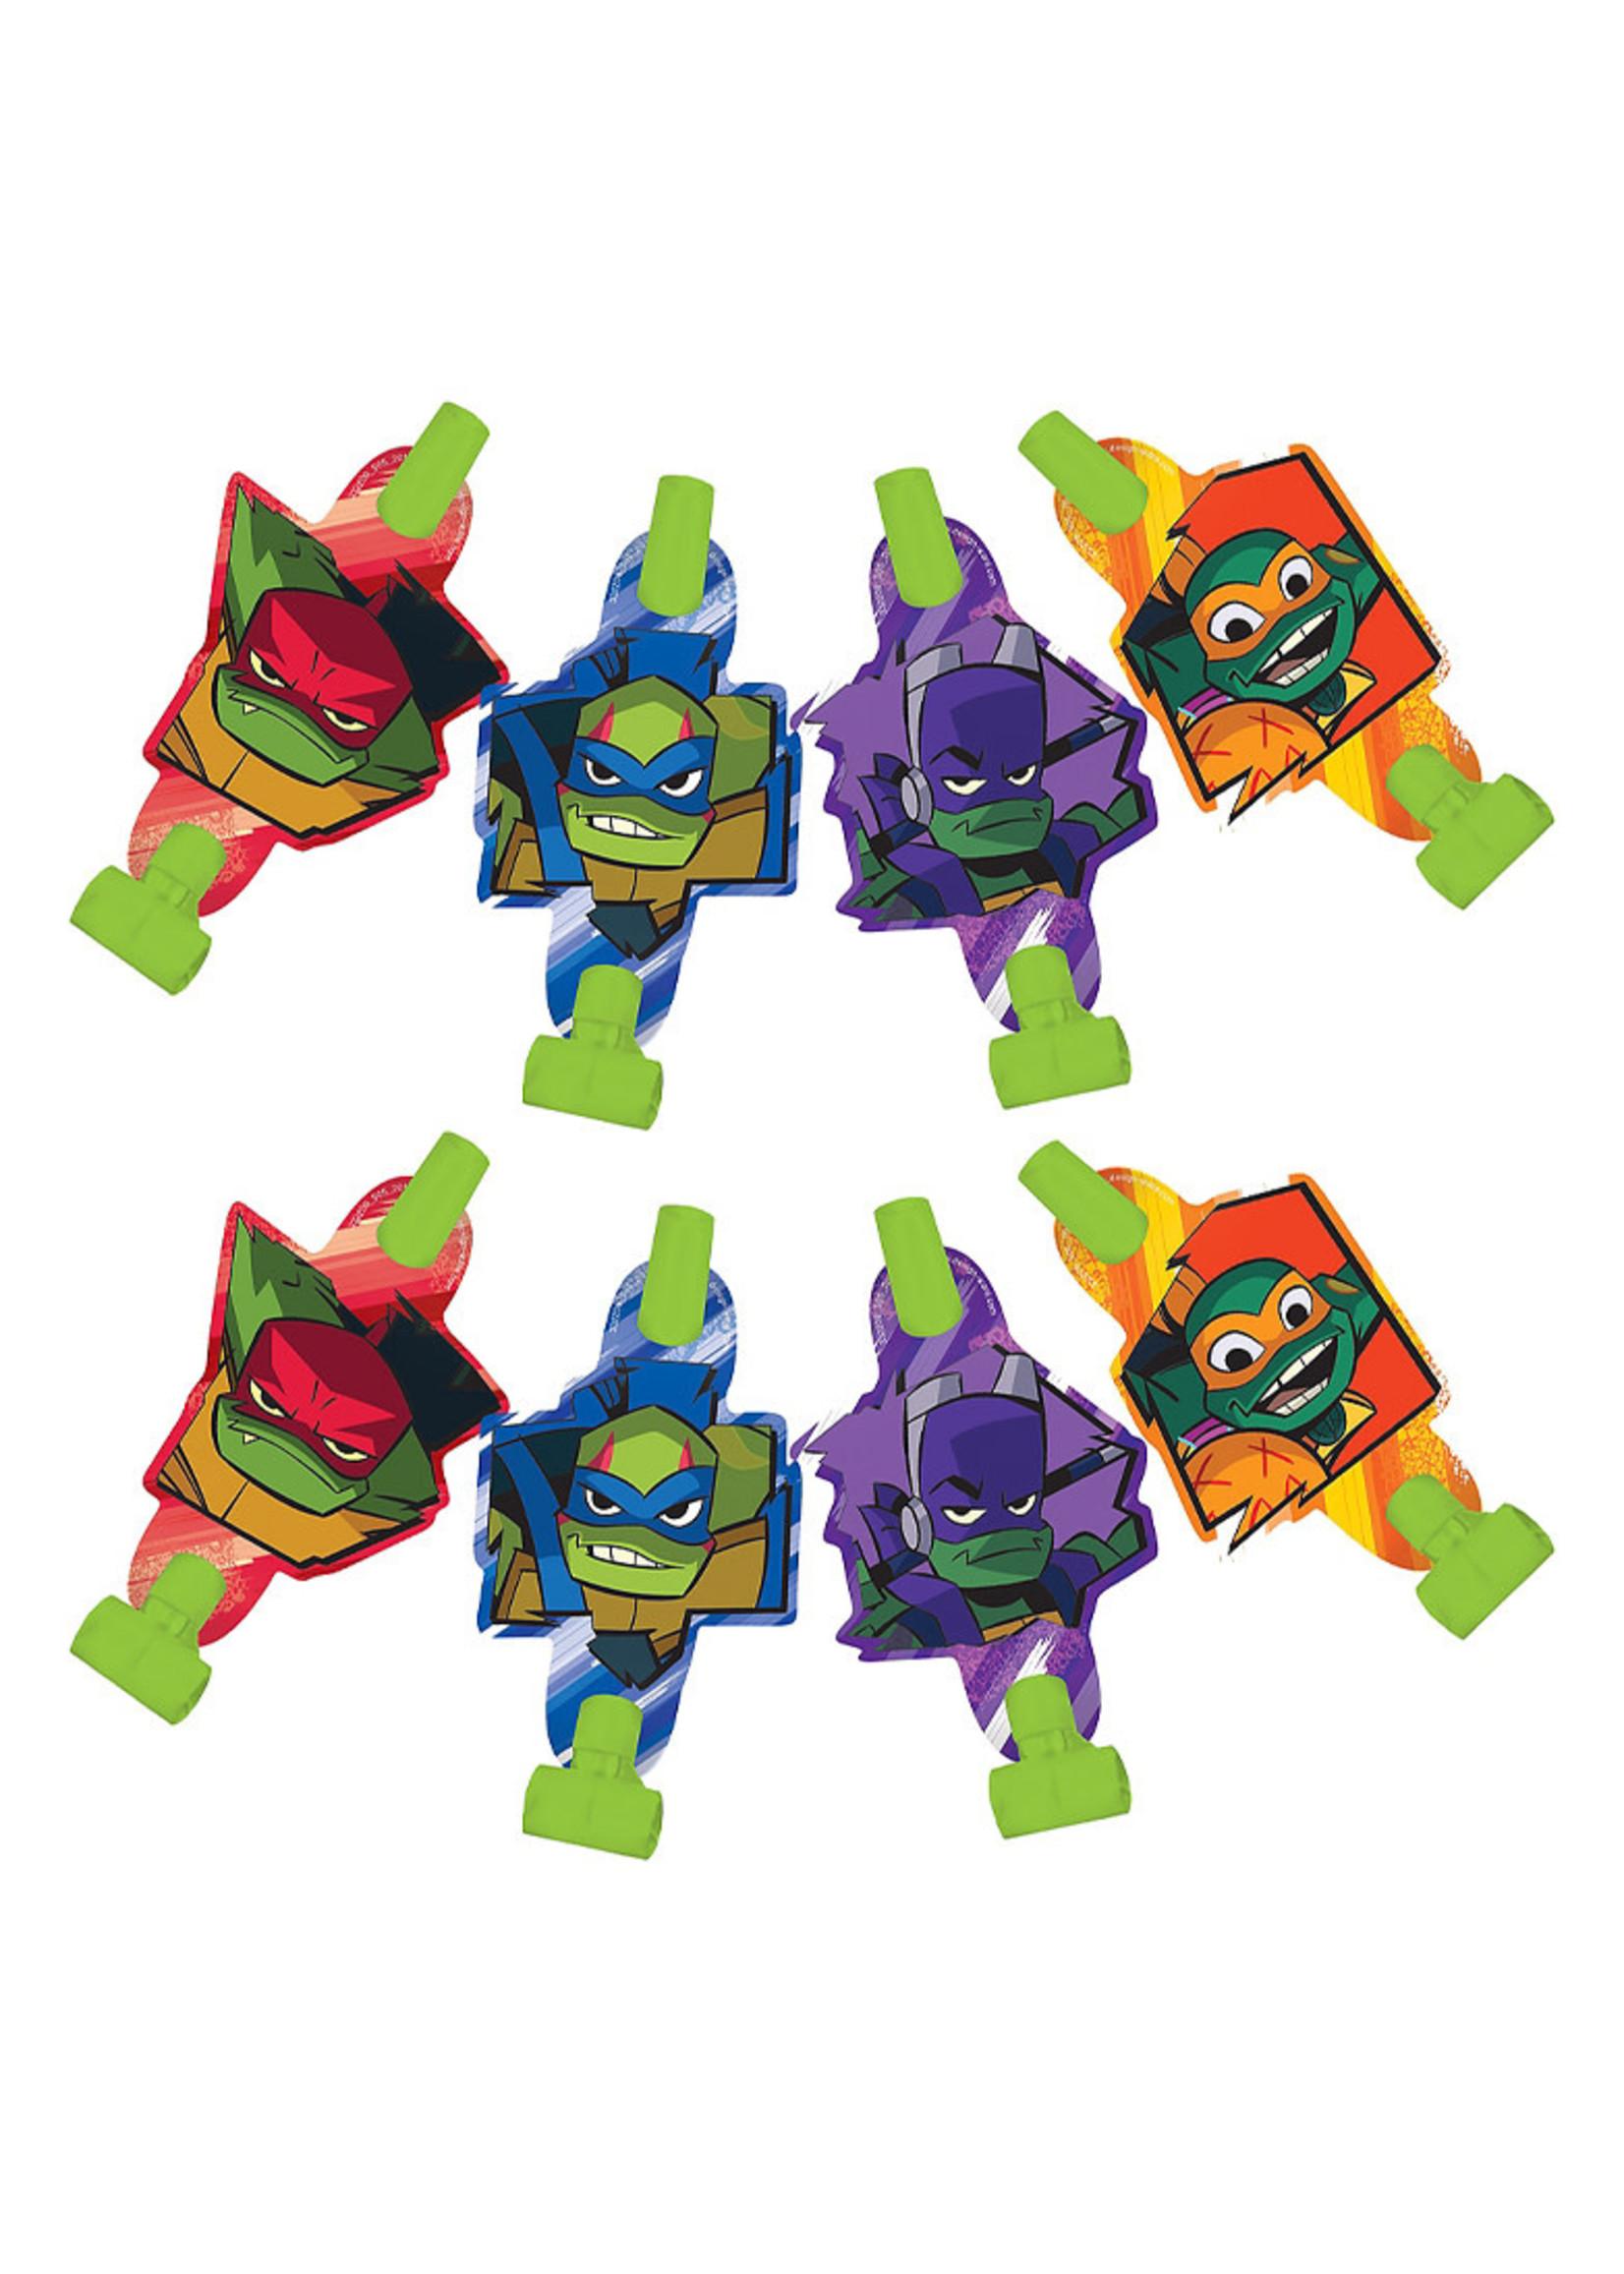 Rise of the Teenage Mutant Ninja Turtles Blowouts 8ct